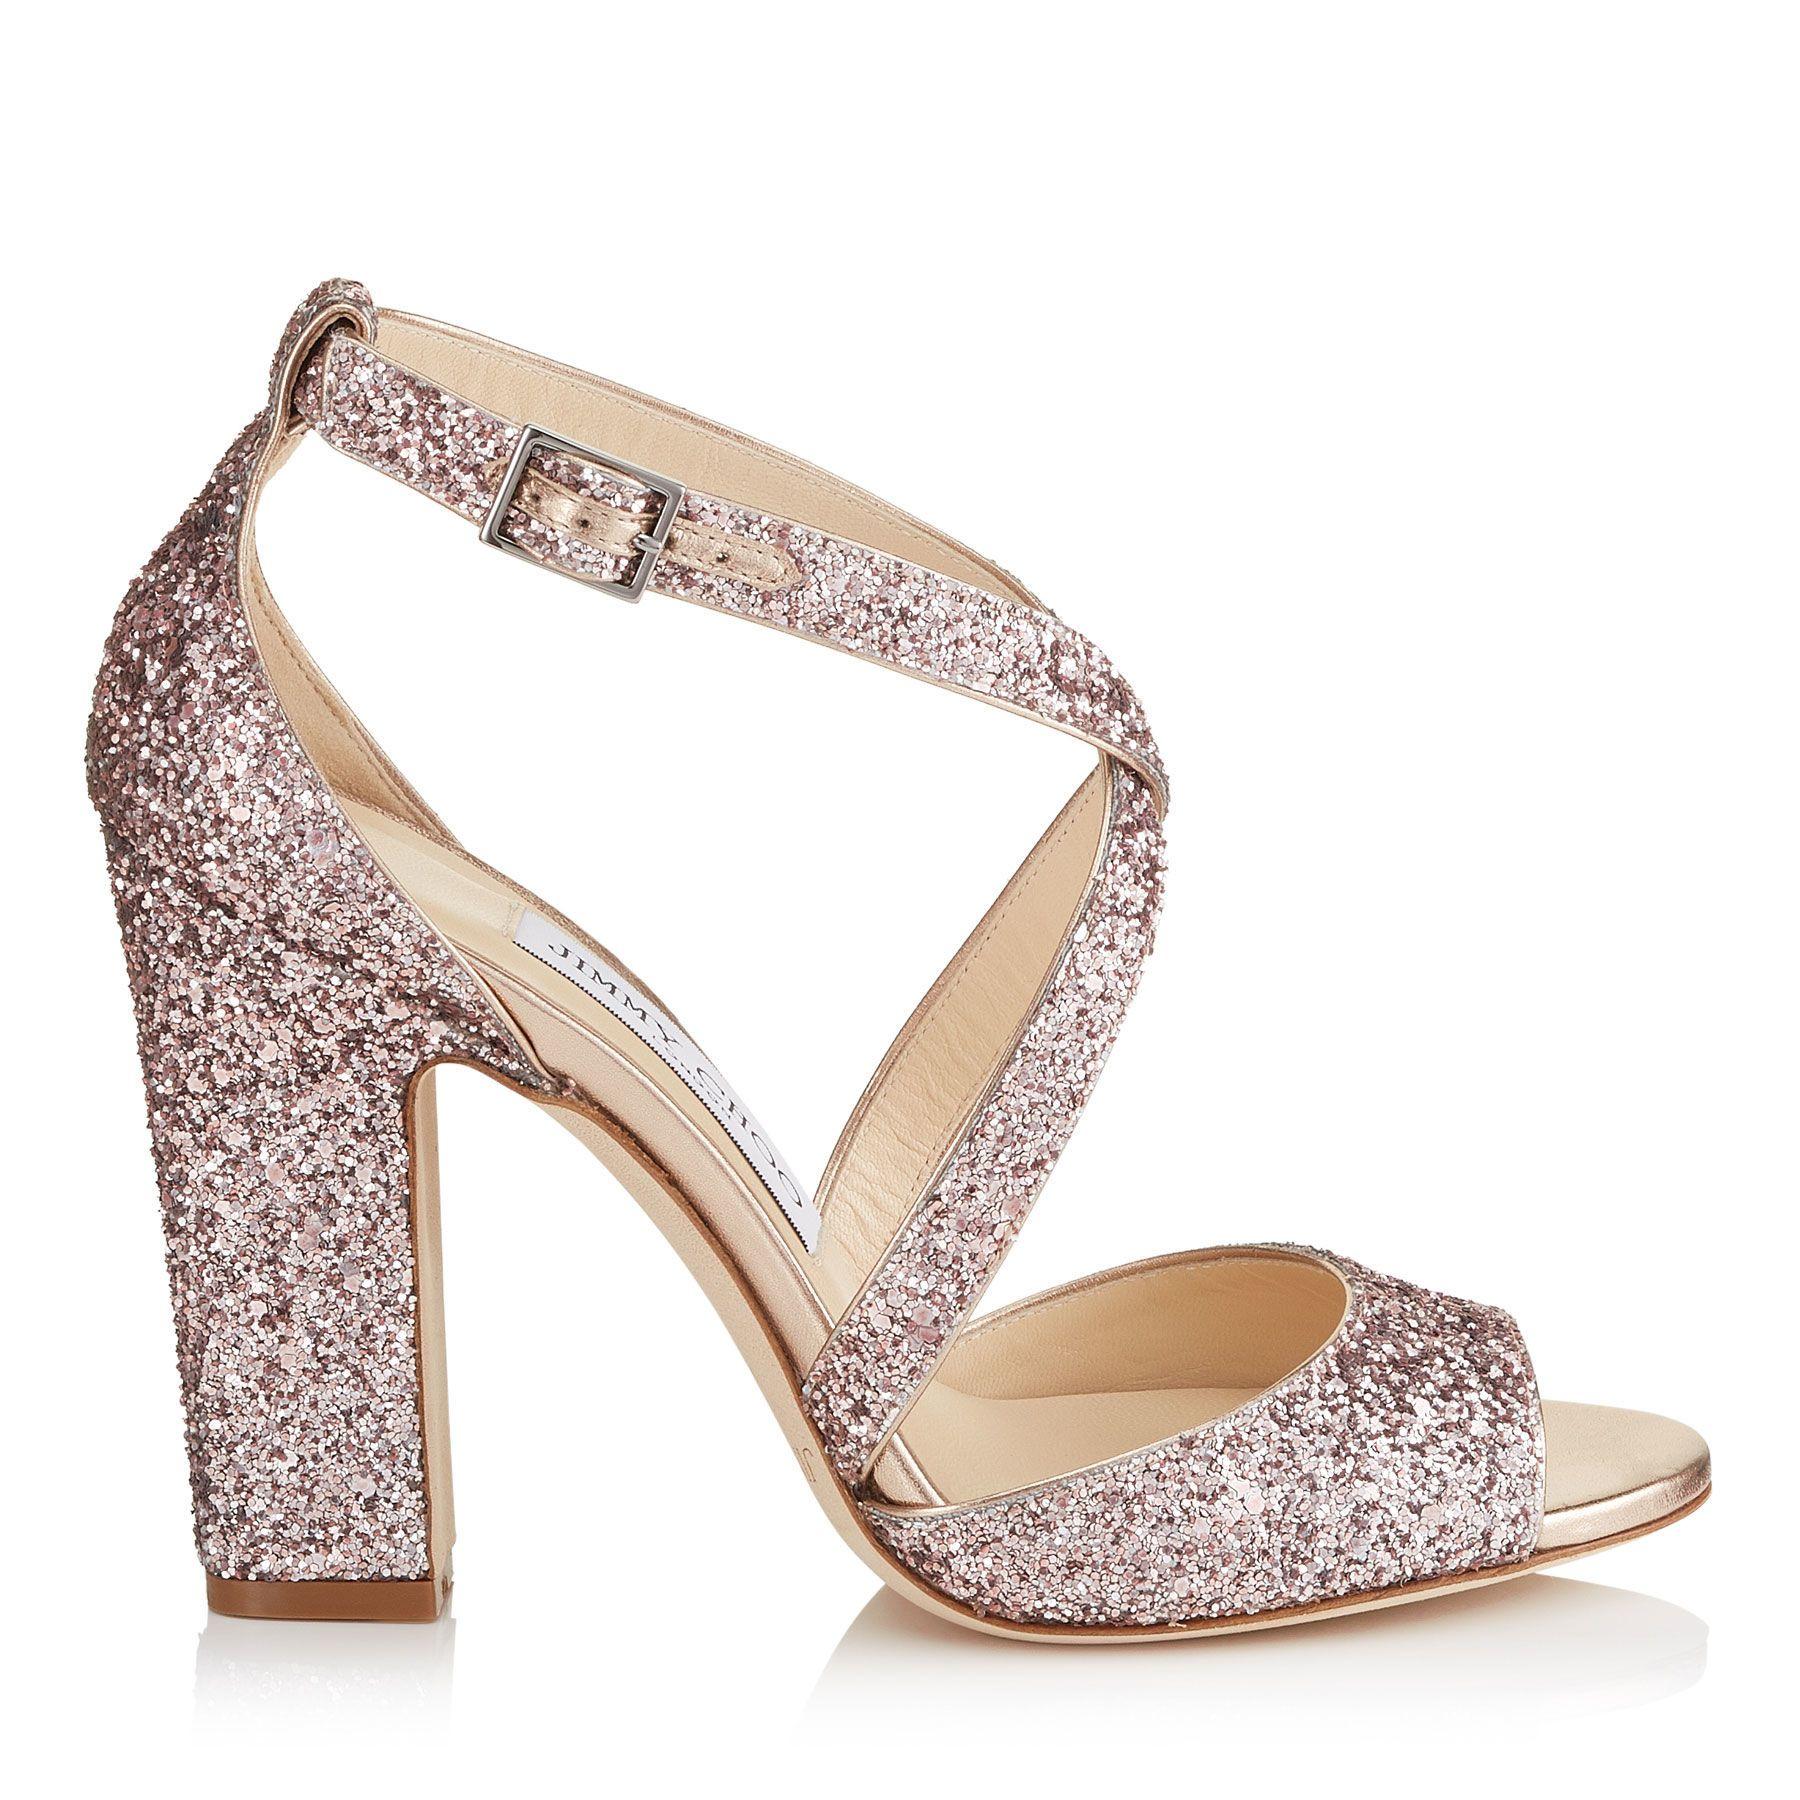 CARRIE 100. Glitter SandalsShoes SandalsGlitter FabricTea RosesParty ShoesChunky  HeelsPeep ToeWedding ShoesJimmy Choo